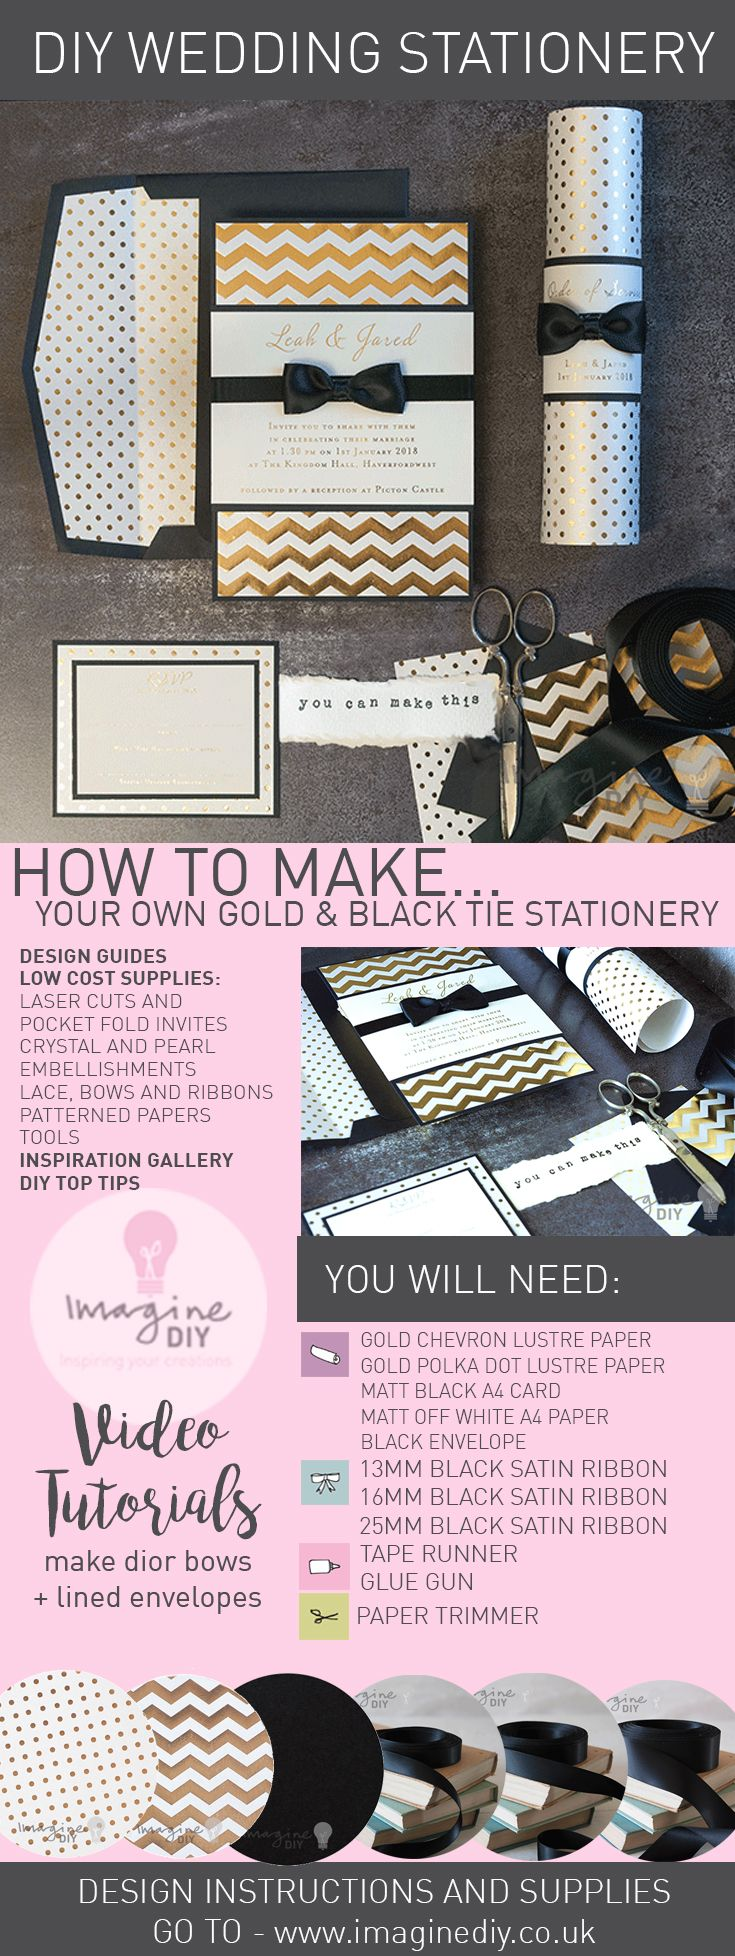 282 best How to Make DIY Wedding Stationery images on Pinterest